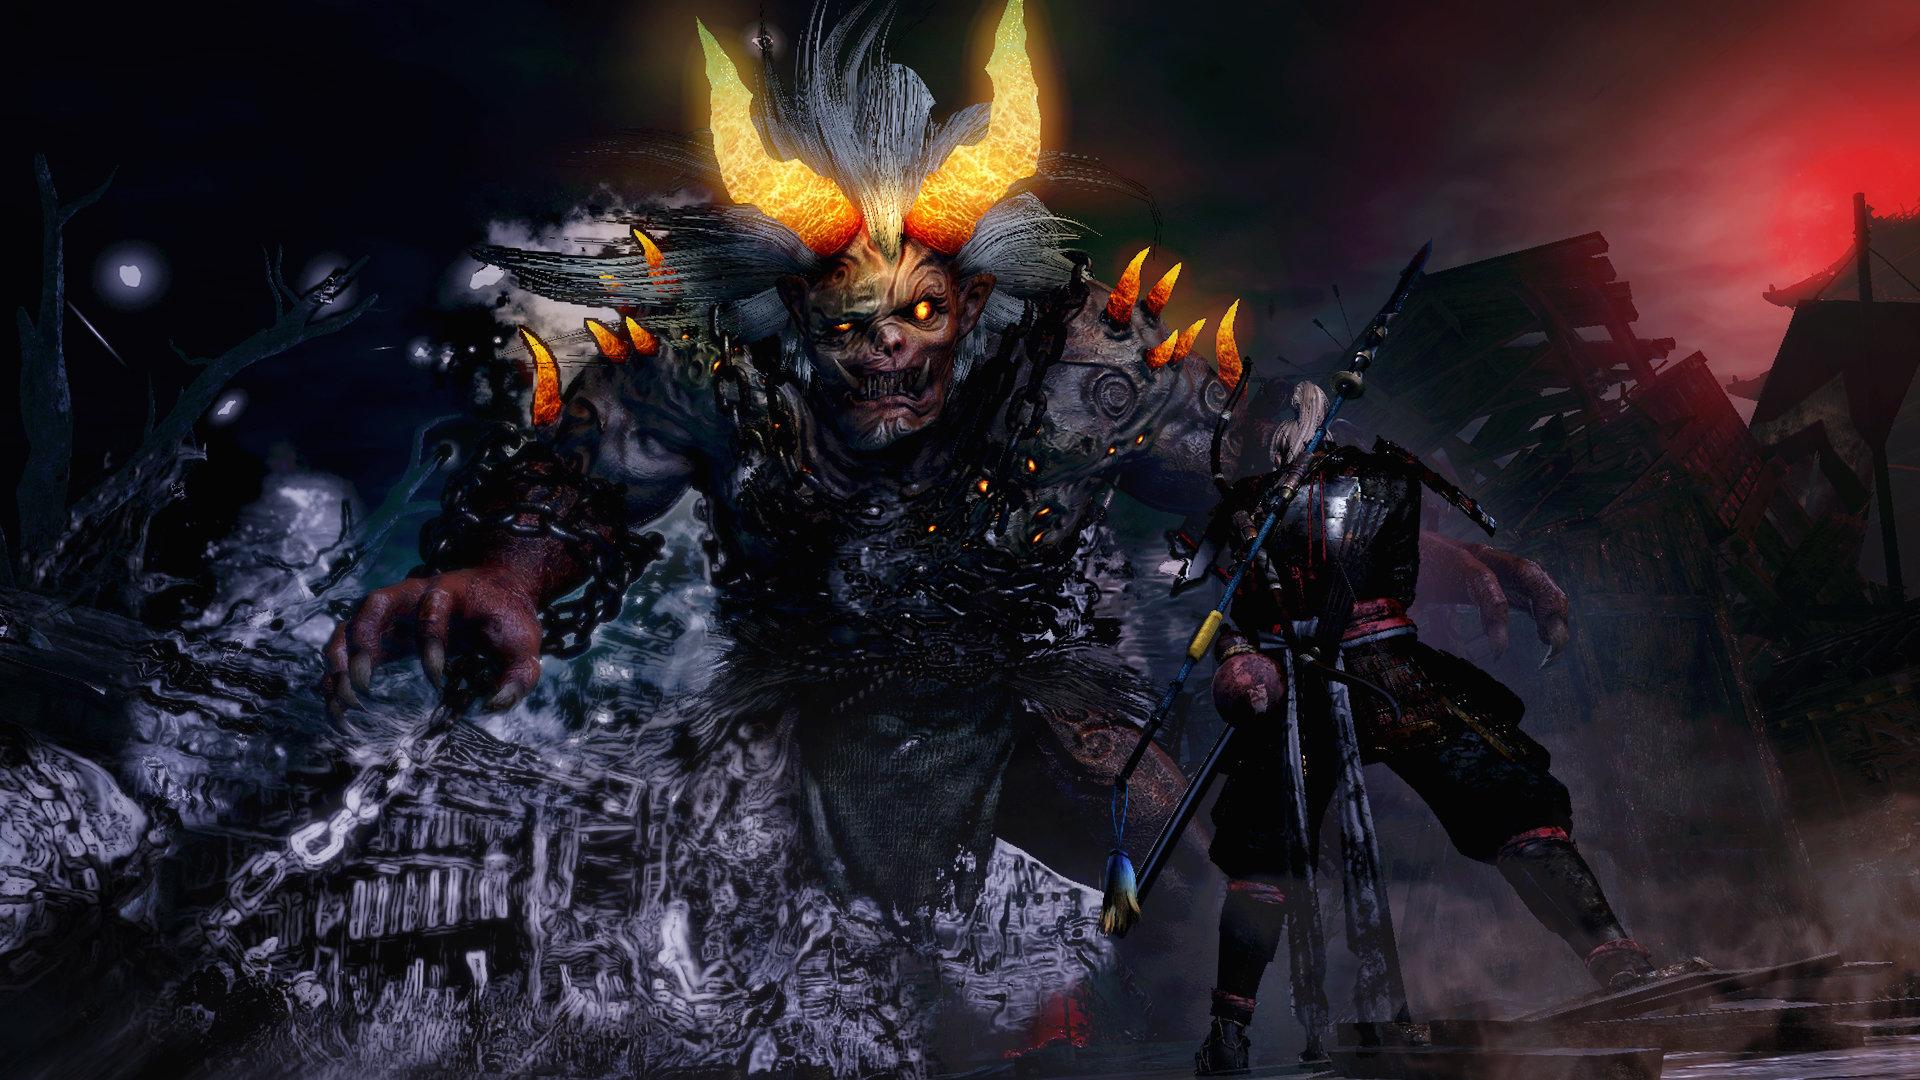 Samurai Action-RPG Nioh: Complete Edition เปิดตัวทางพีซีในวันที่ 7 พฤศจิกายน